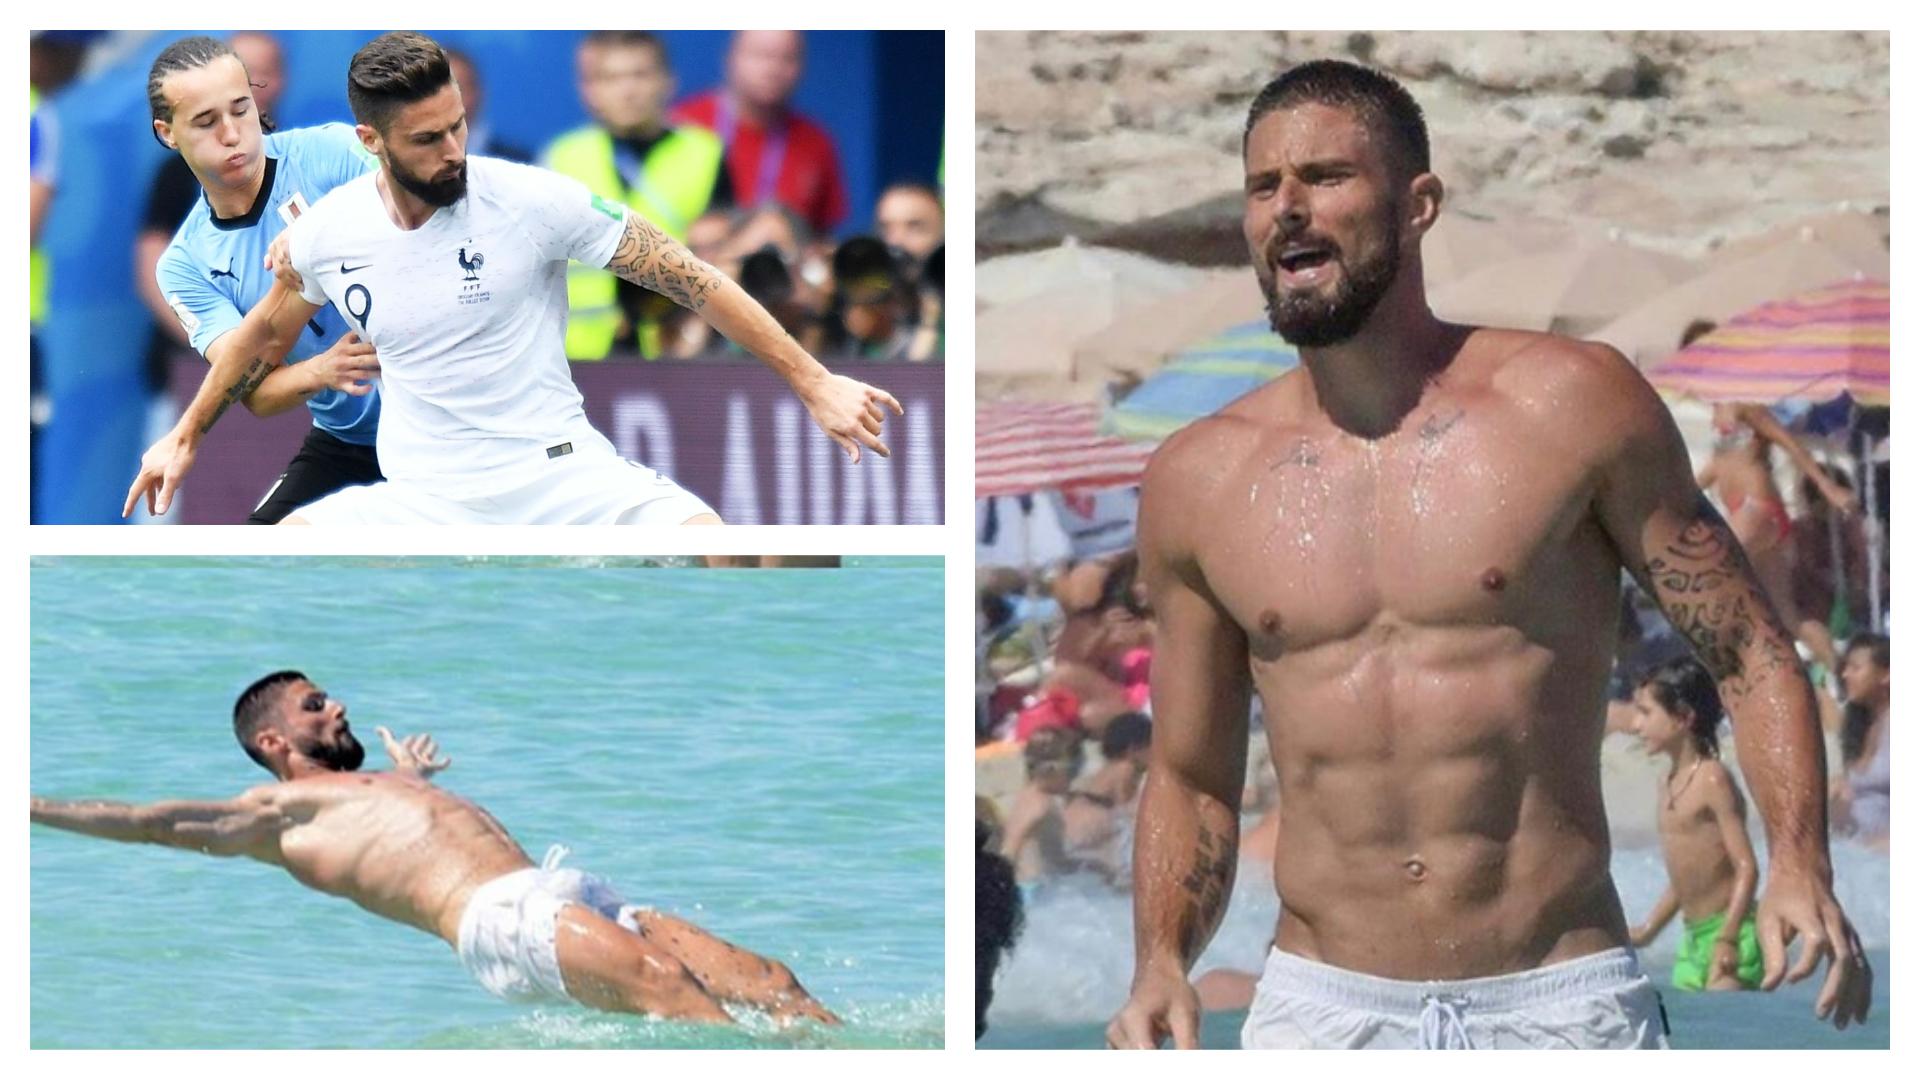 Na gay hrvatskom test Quiz: Who